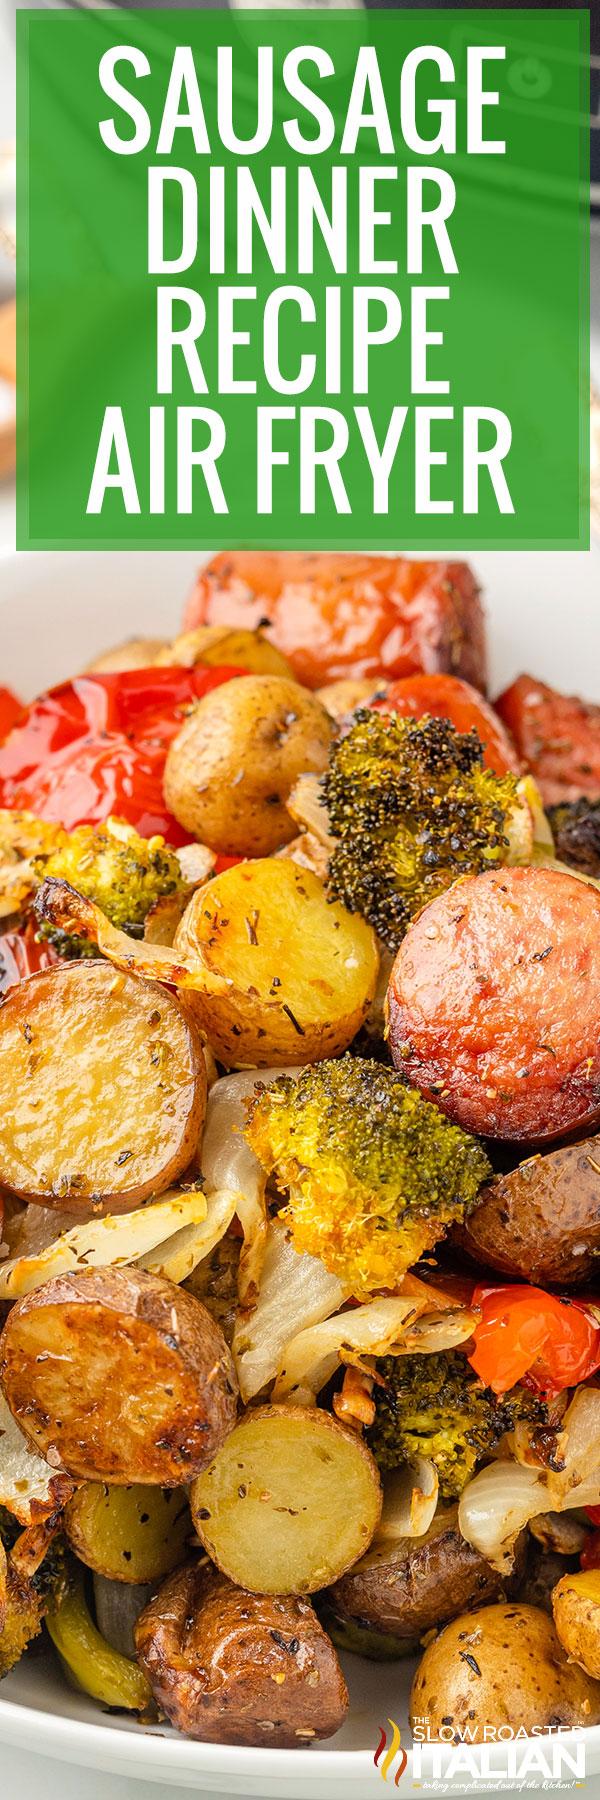 Sausage Dinner Recipe (Air Fryer)